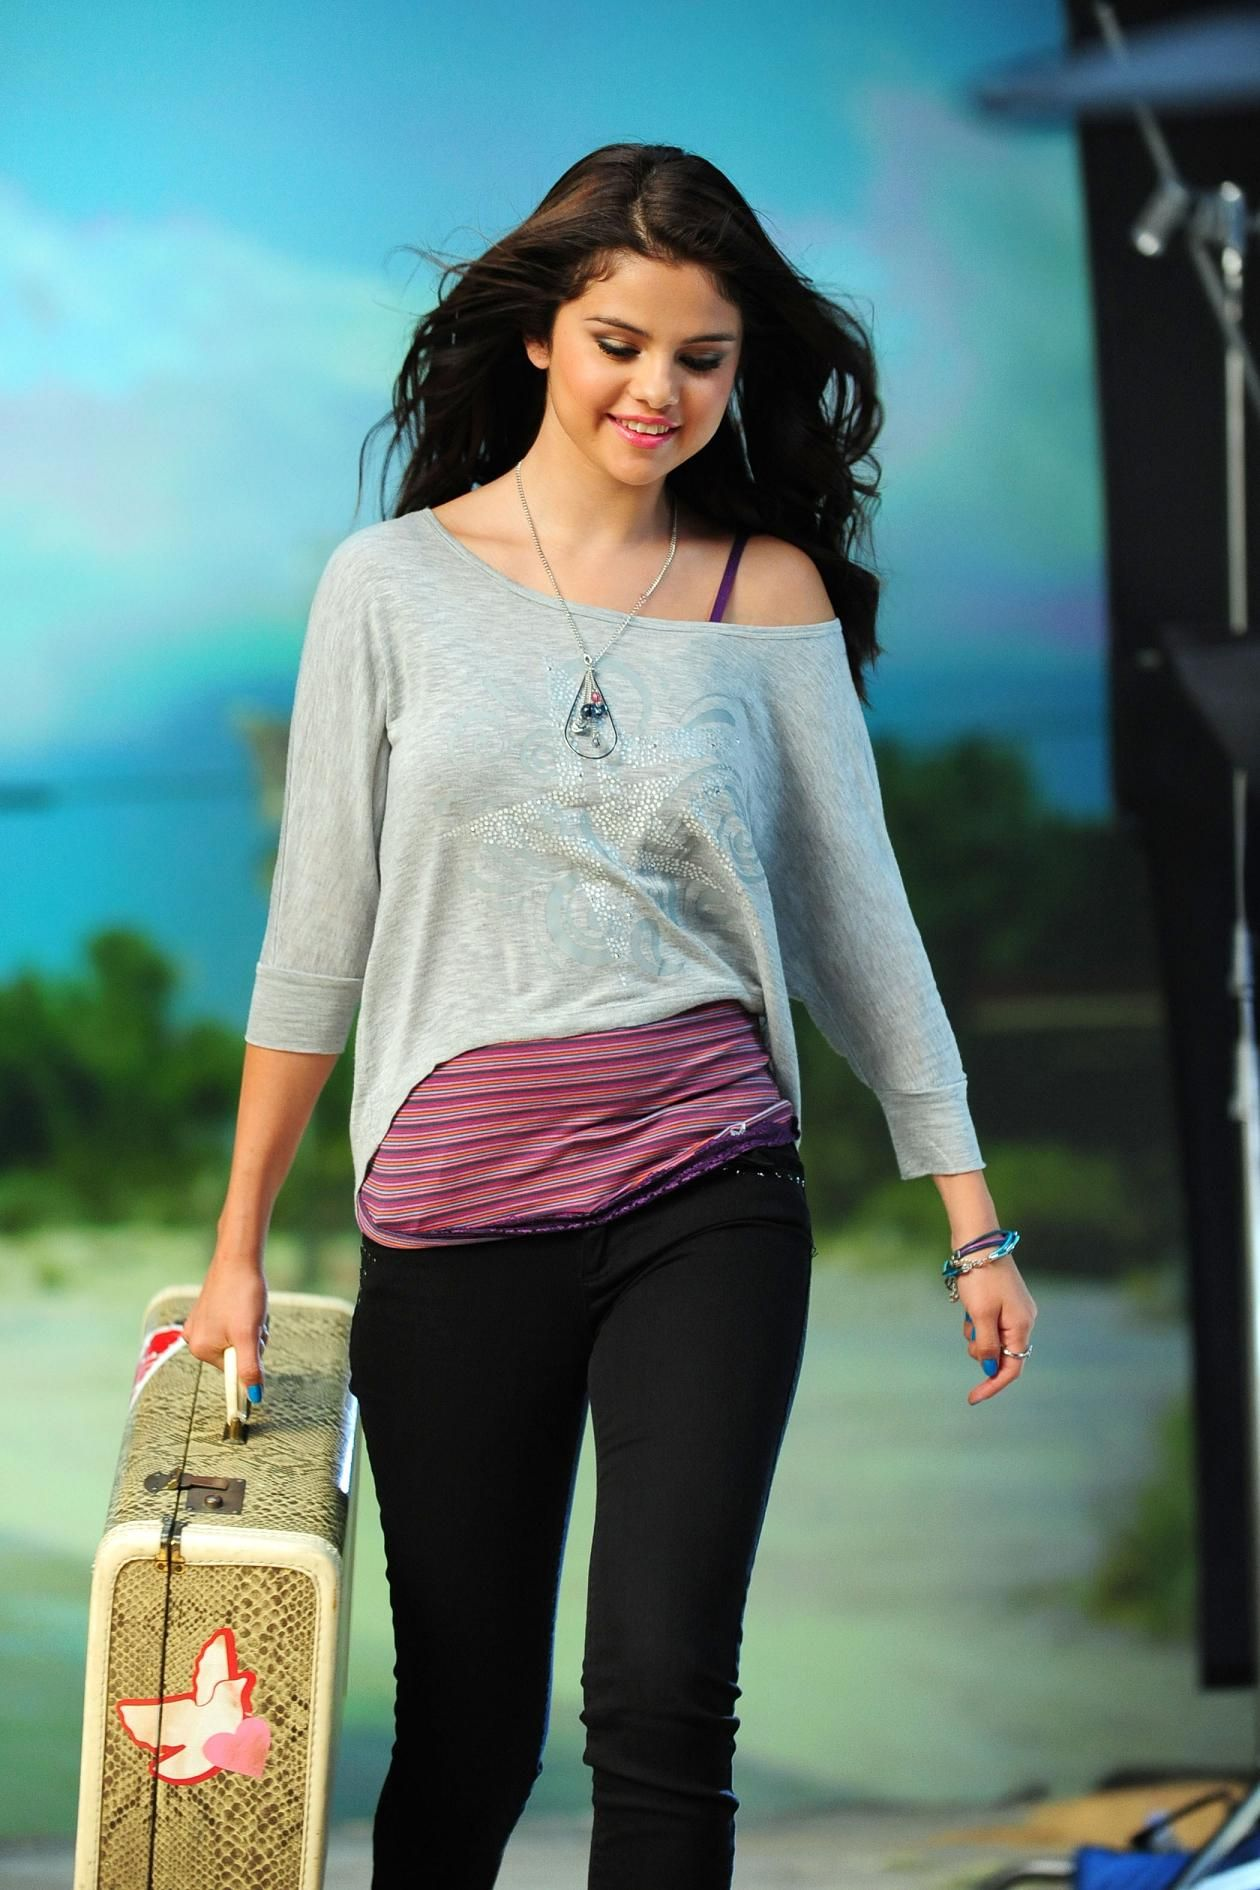 selena gomez dream out loud collection | Selena Gomez - Dream Out Loud behind the scenes Fall Collection 2012 ...